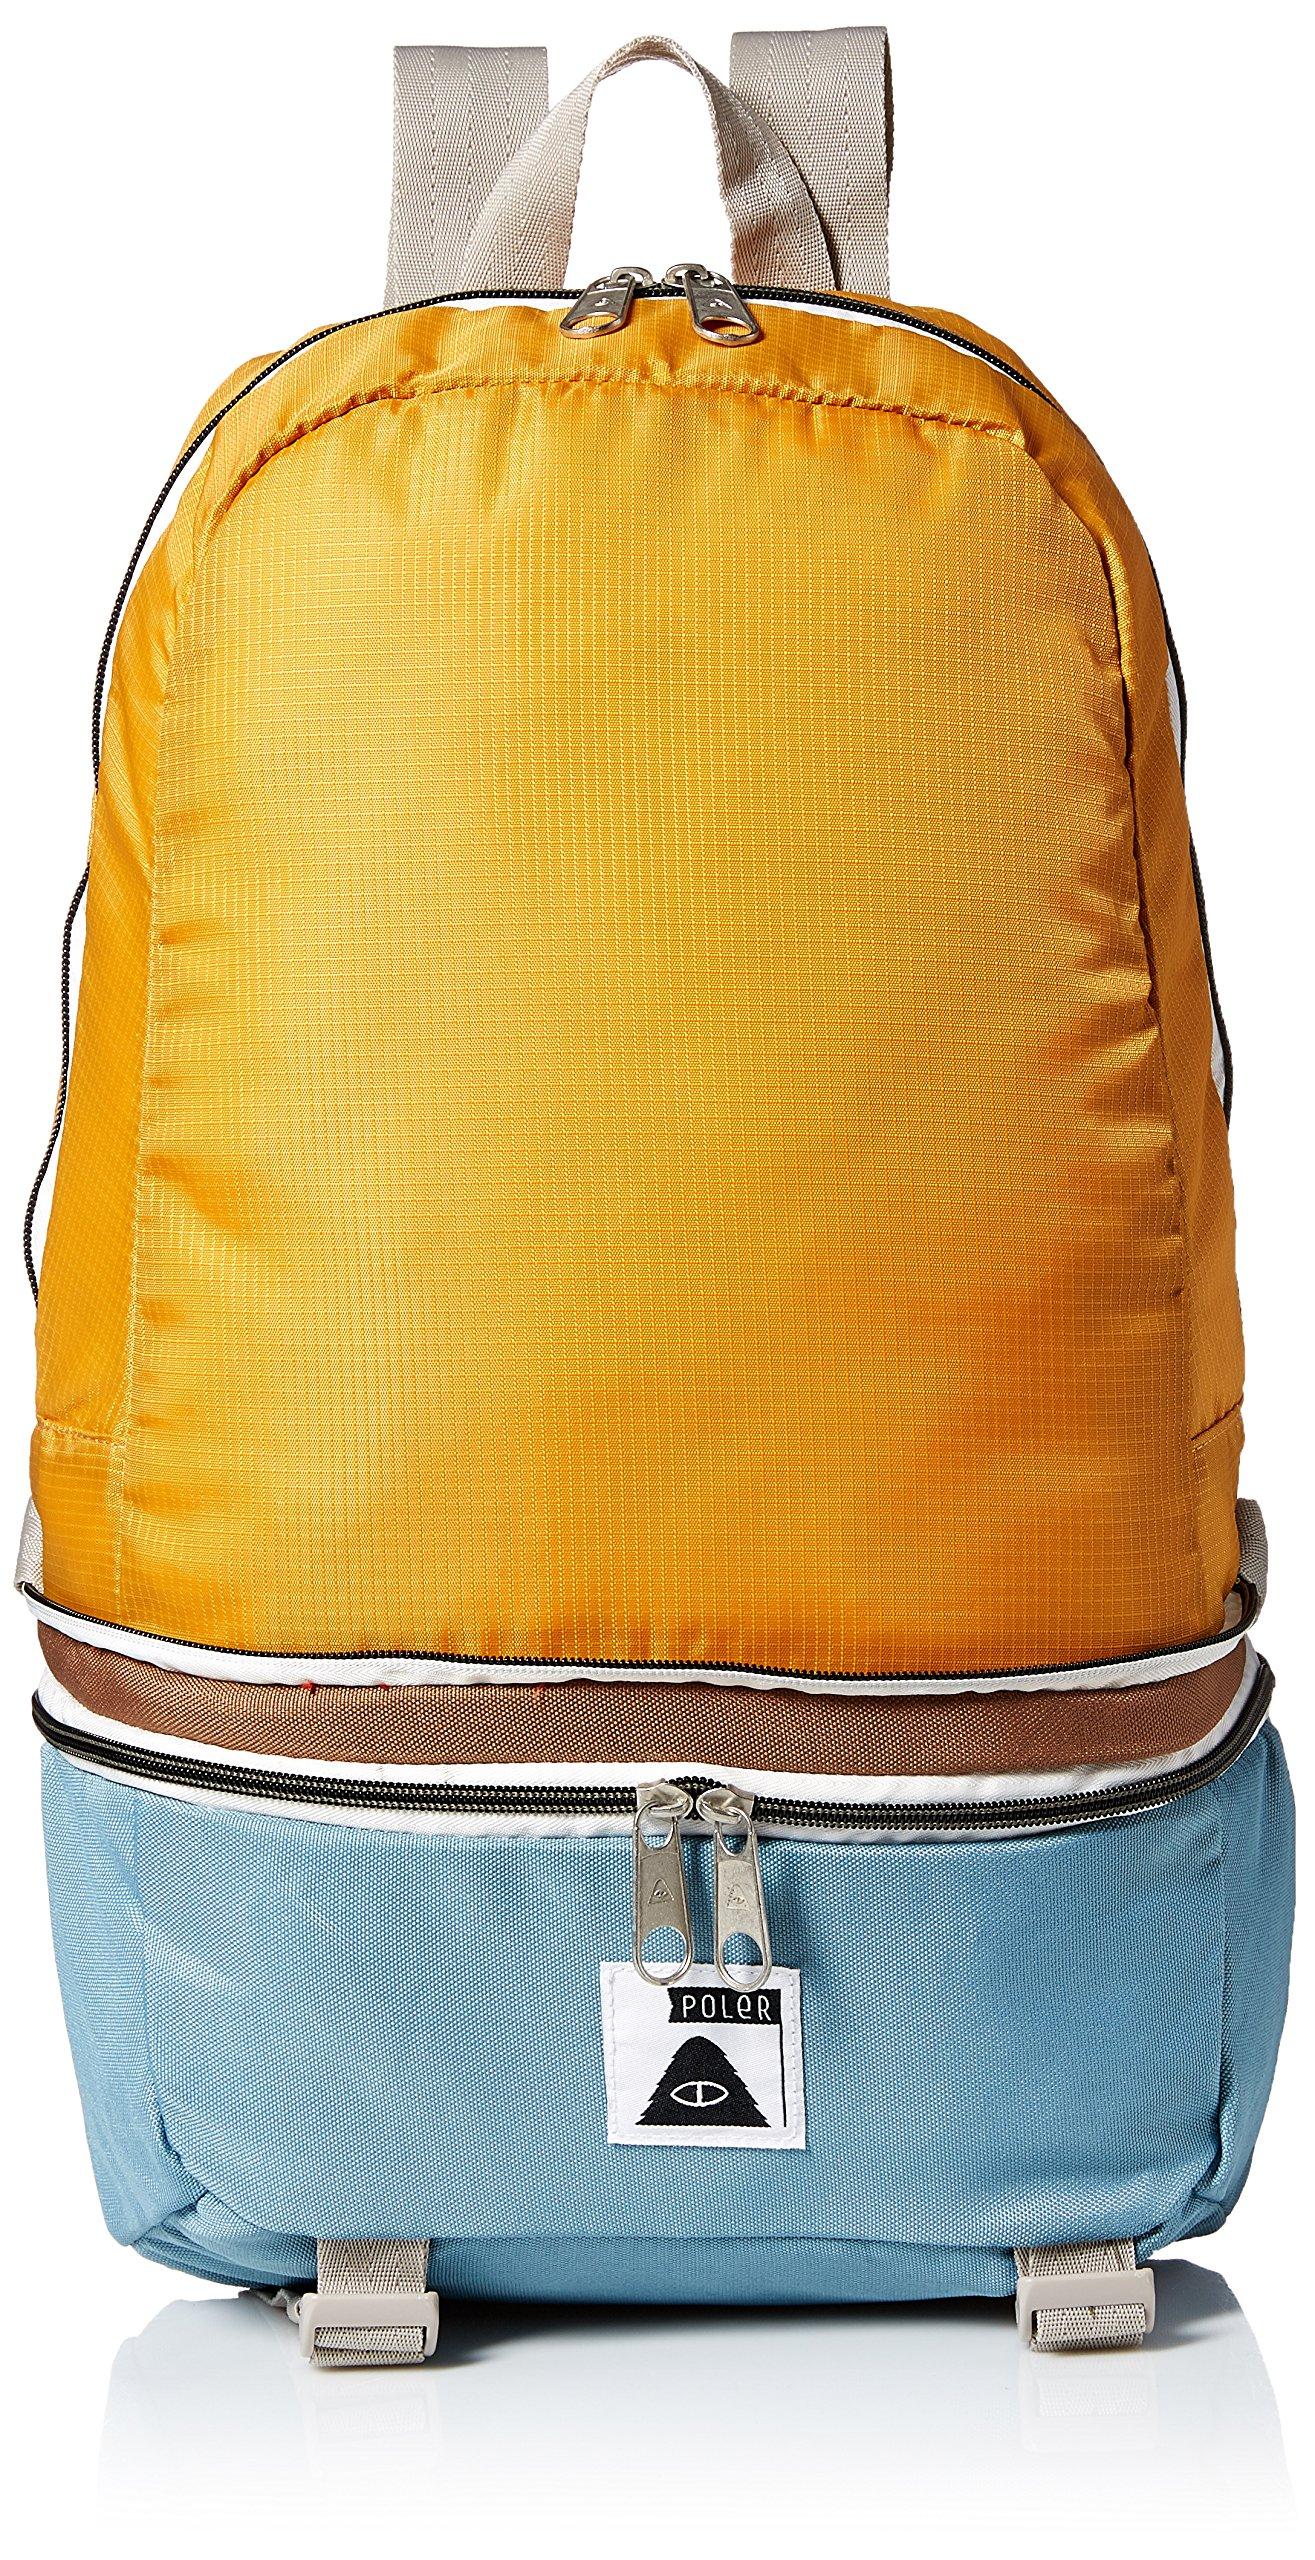 Poler Men's Tourist Pack, Mustard, One Size